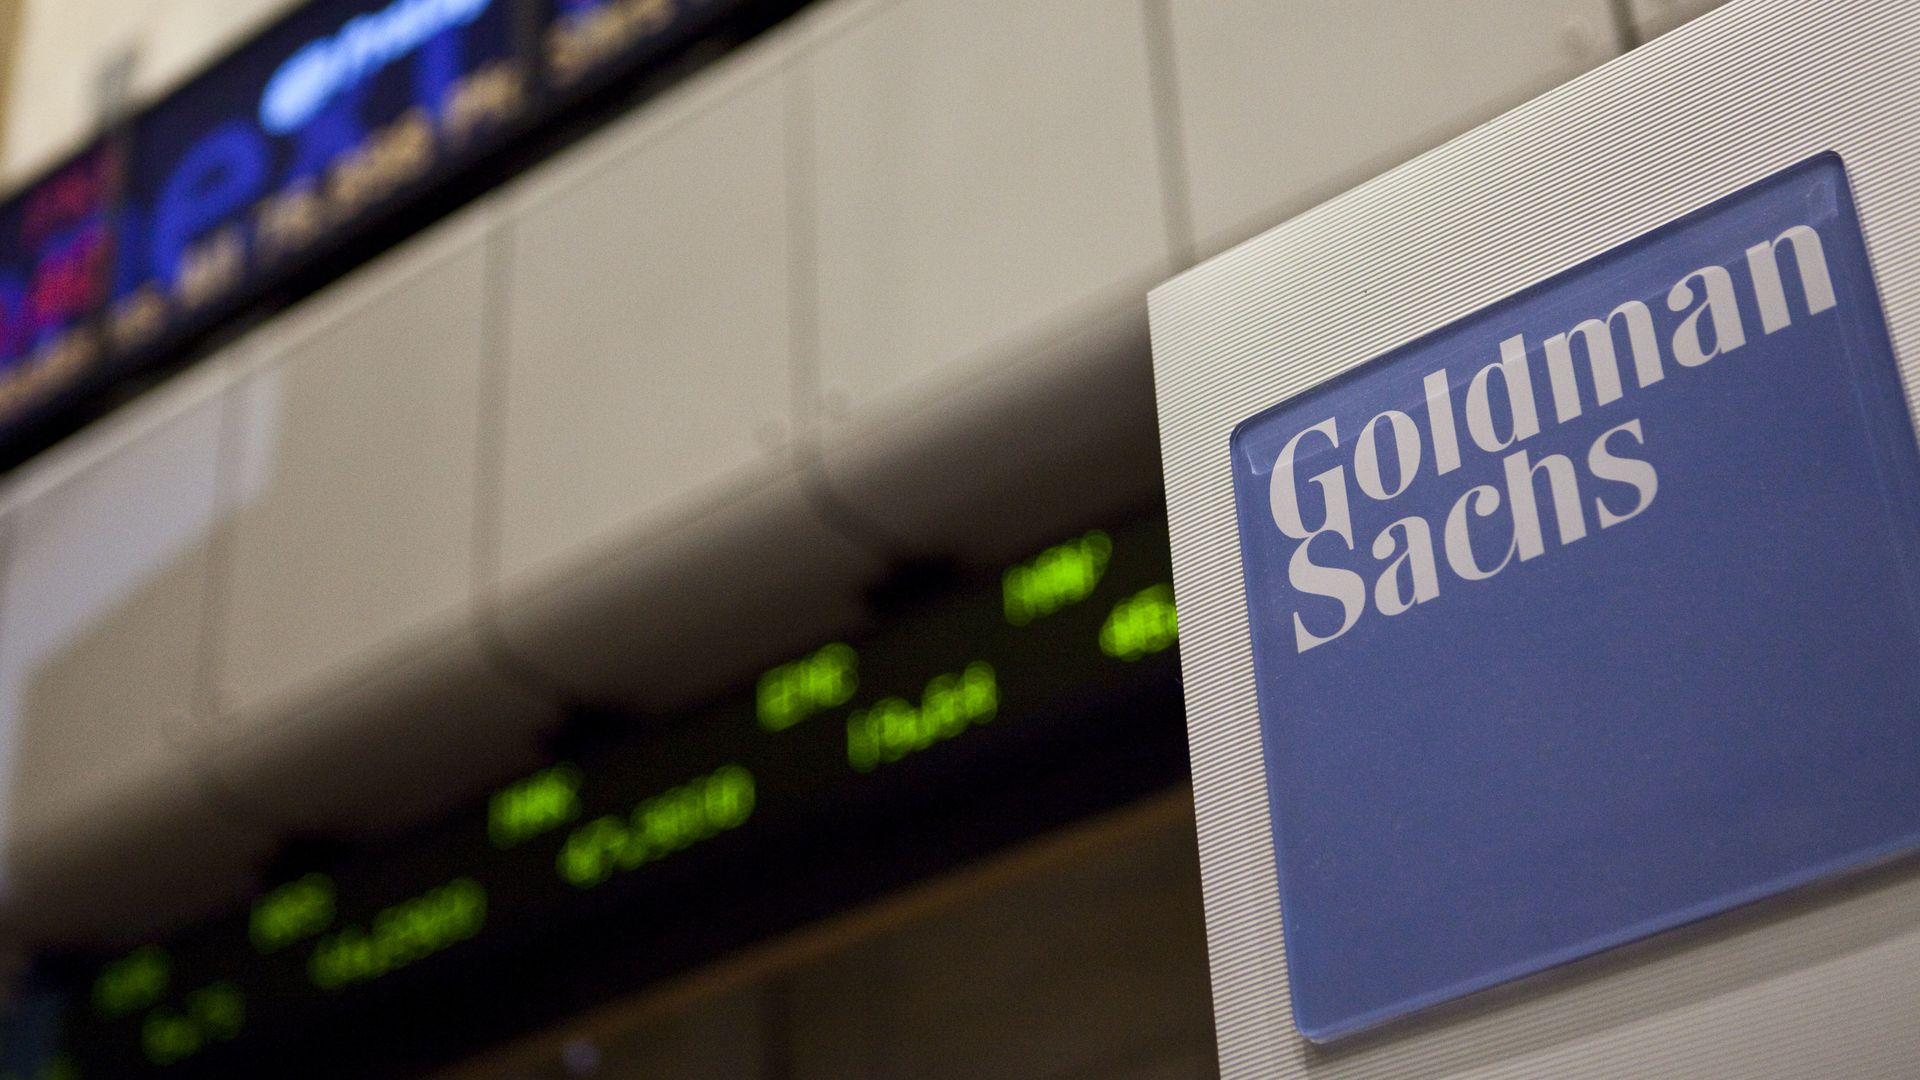 Goldman Sachs logo.